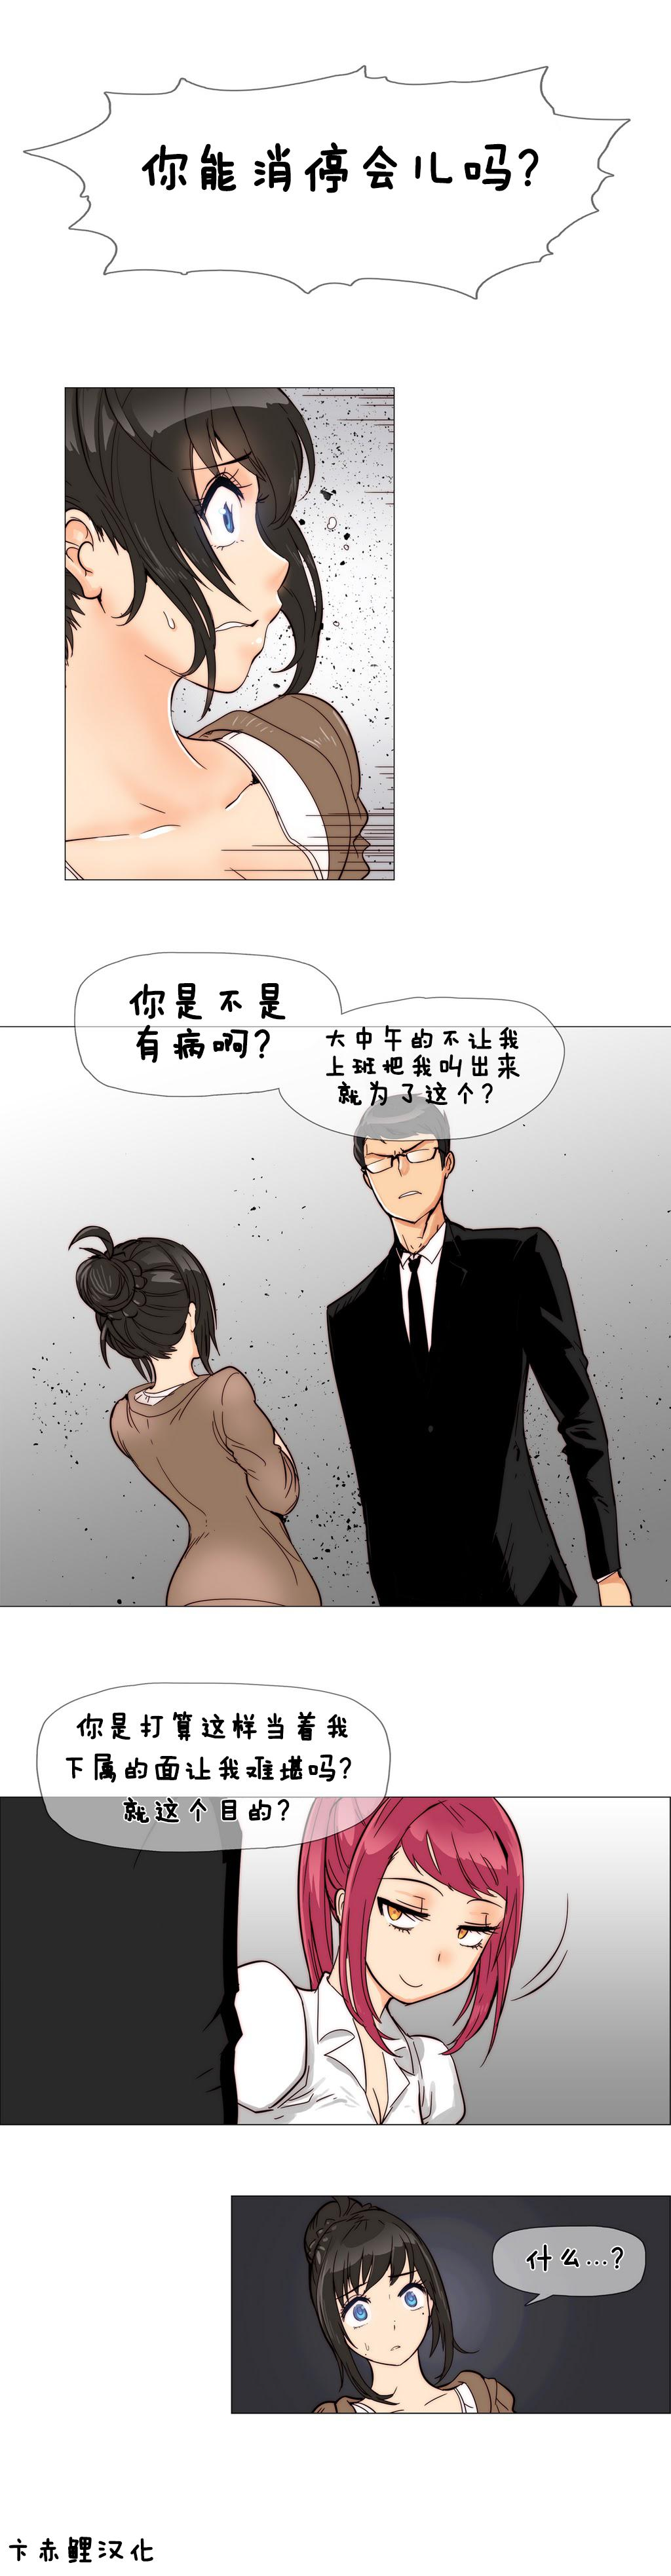 HouseHold Affairs 【卞赤鲤个人汉化】1~21话(持续更新中) 96